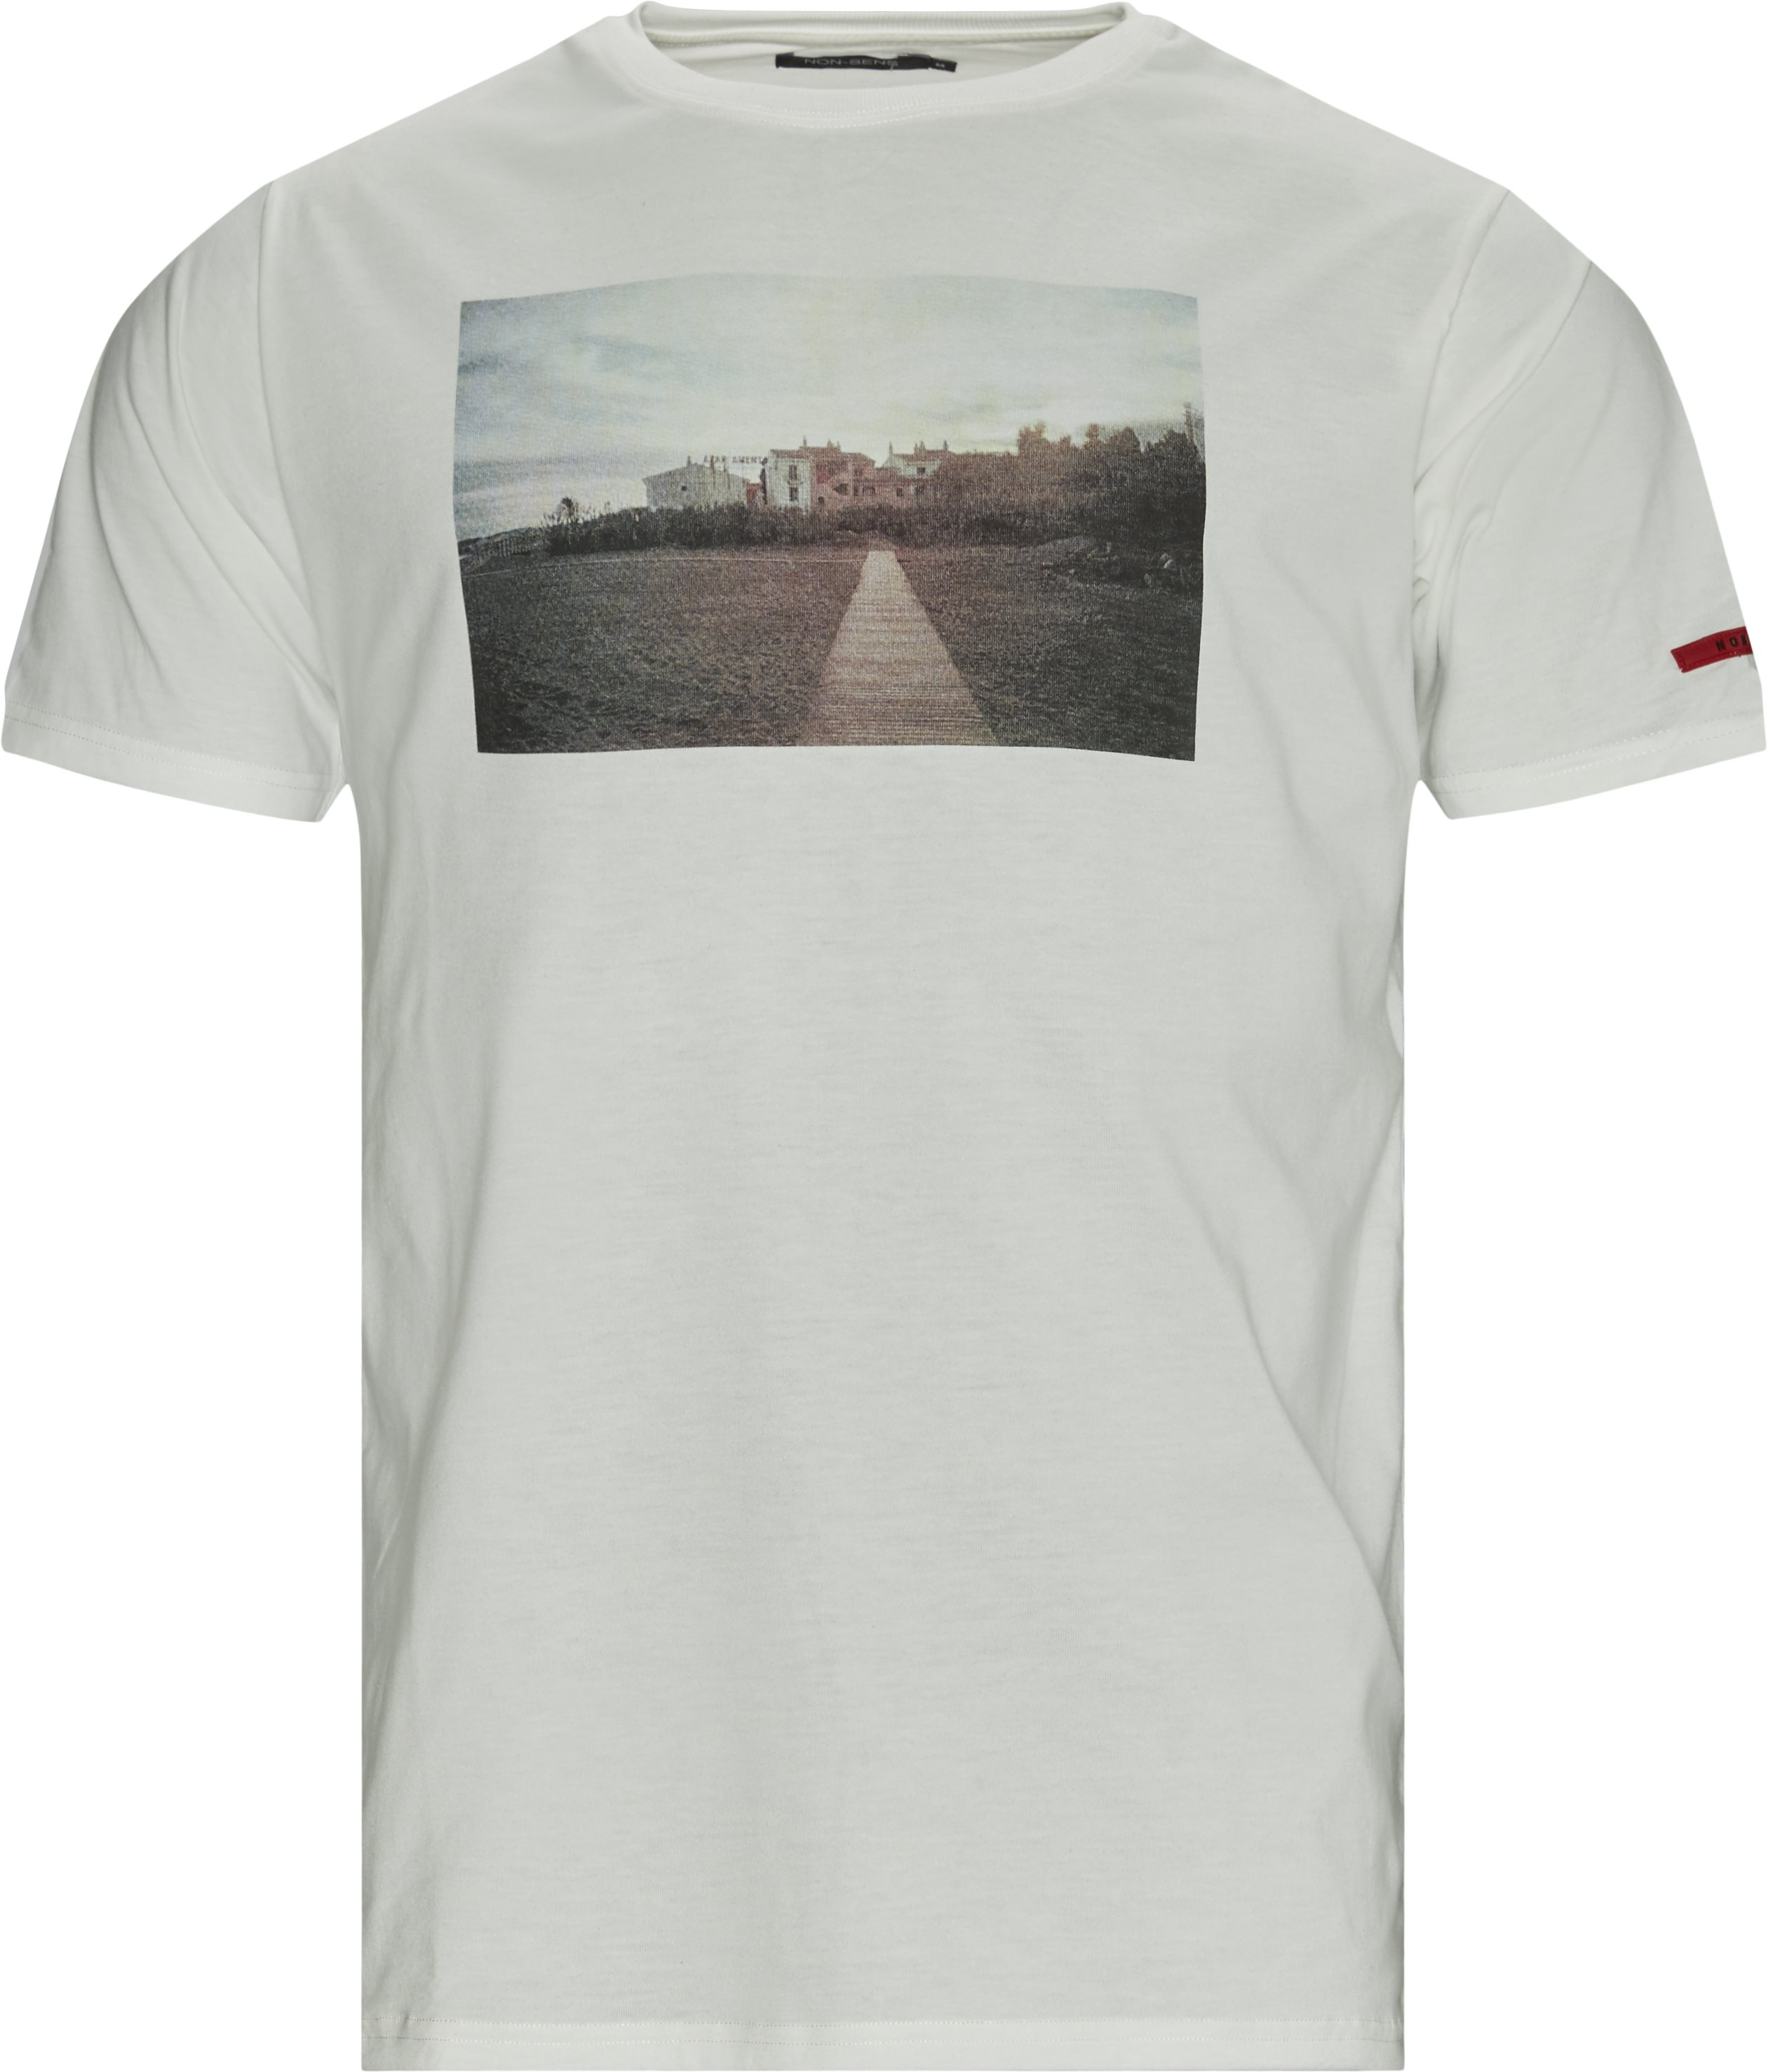 Beach T-shirt - T-shirts - Regular fit - Hvid